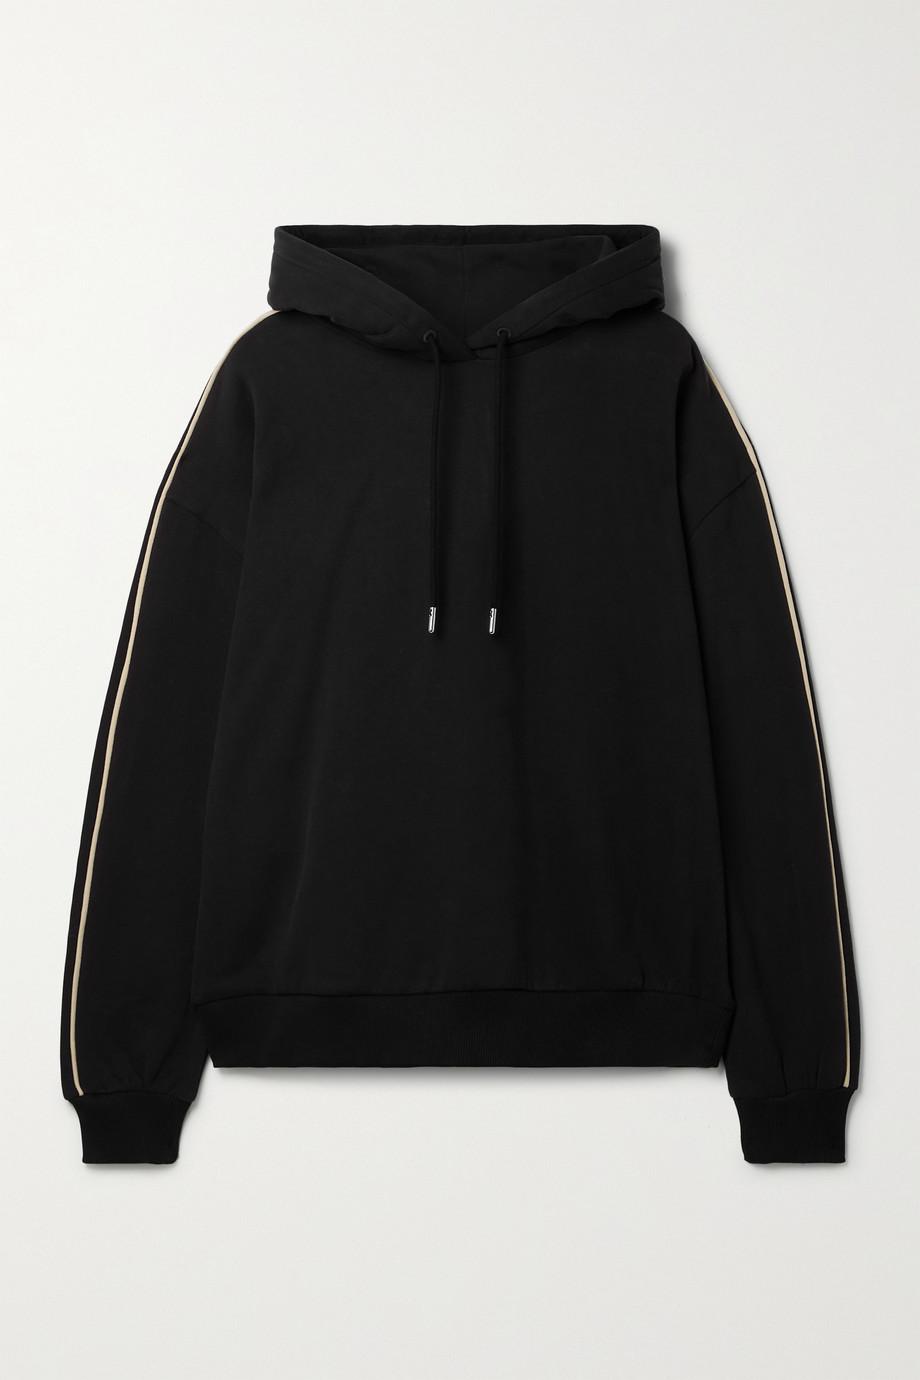 Ninety Percent + NET SUSTAIN organic cotton-jersey hoodie